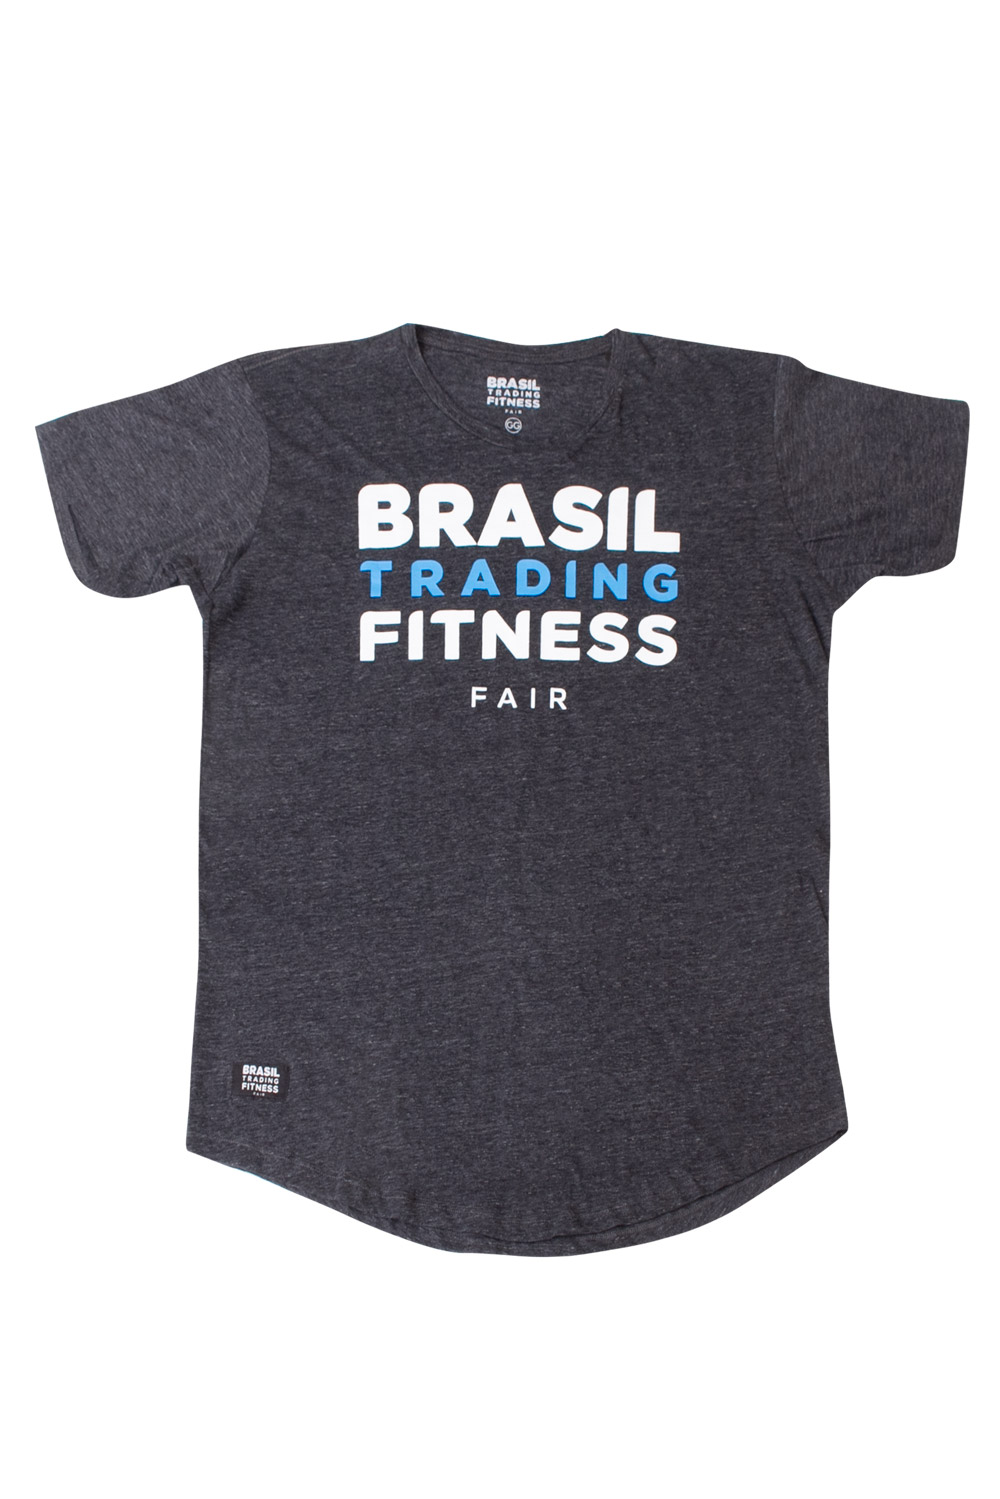 Camiseta Masculina BTFF - B46998  - CROCKER JEANS